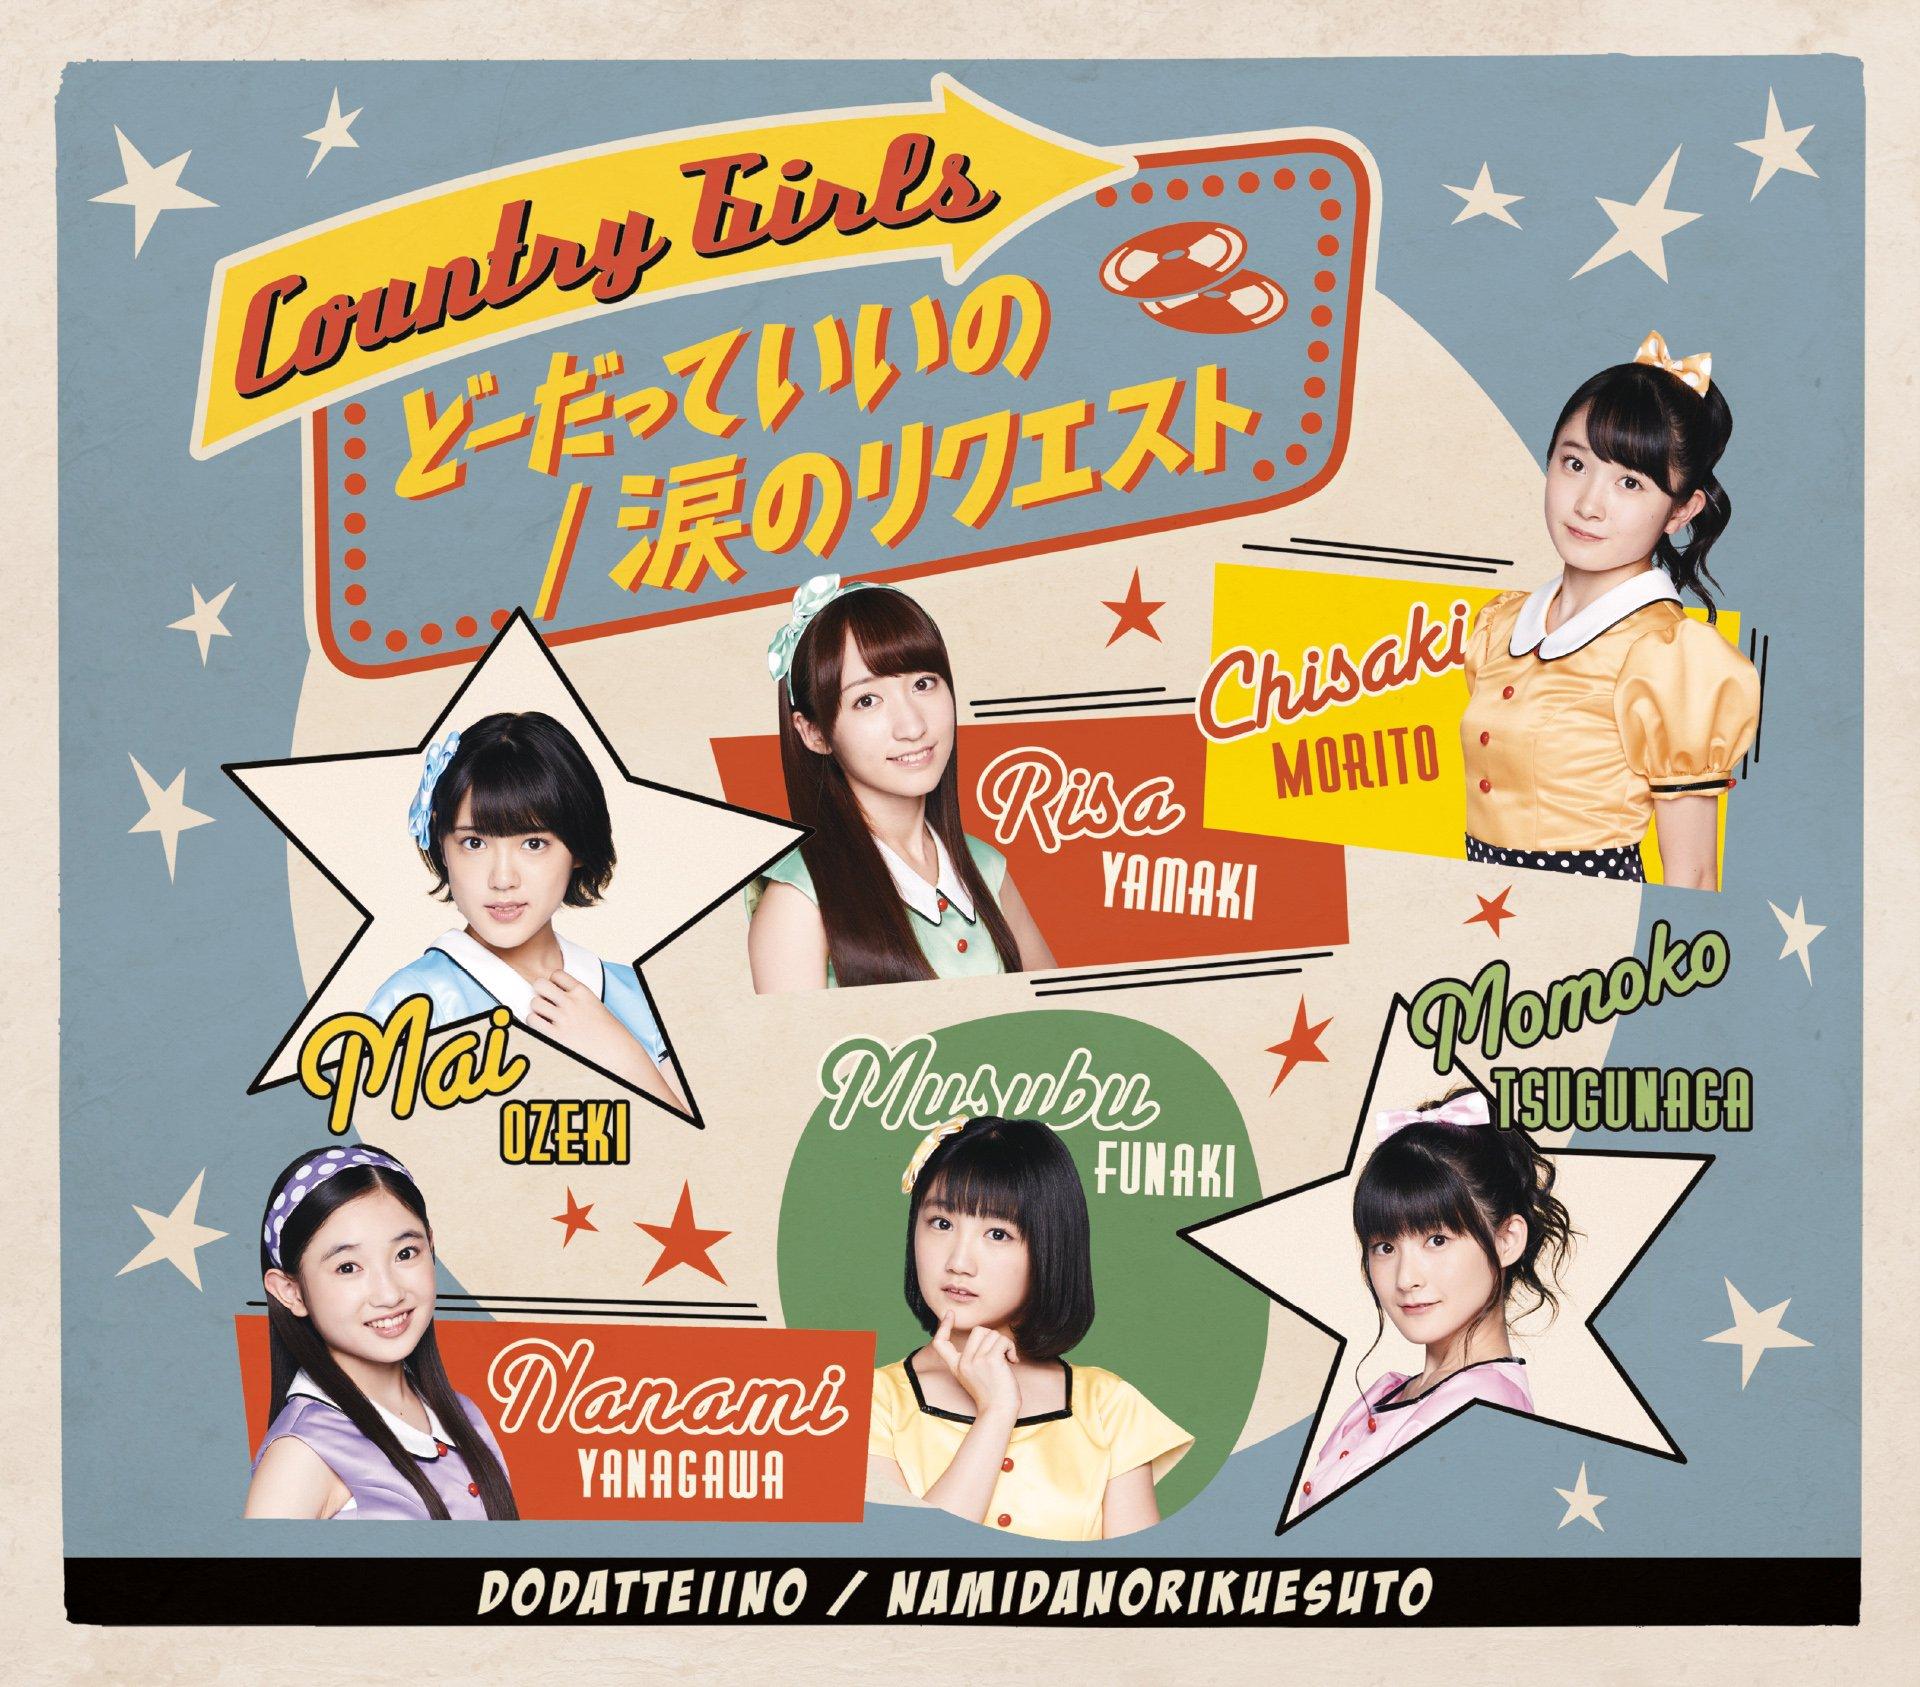 20161219.02.04 Country Girls - Dou Datte Ii no ~ Namida no Request (M4A) cover 1.jpg